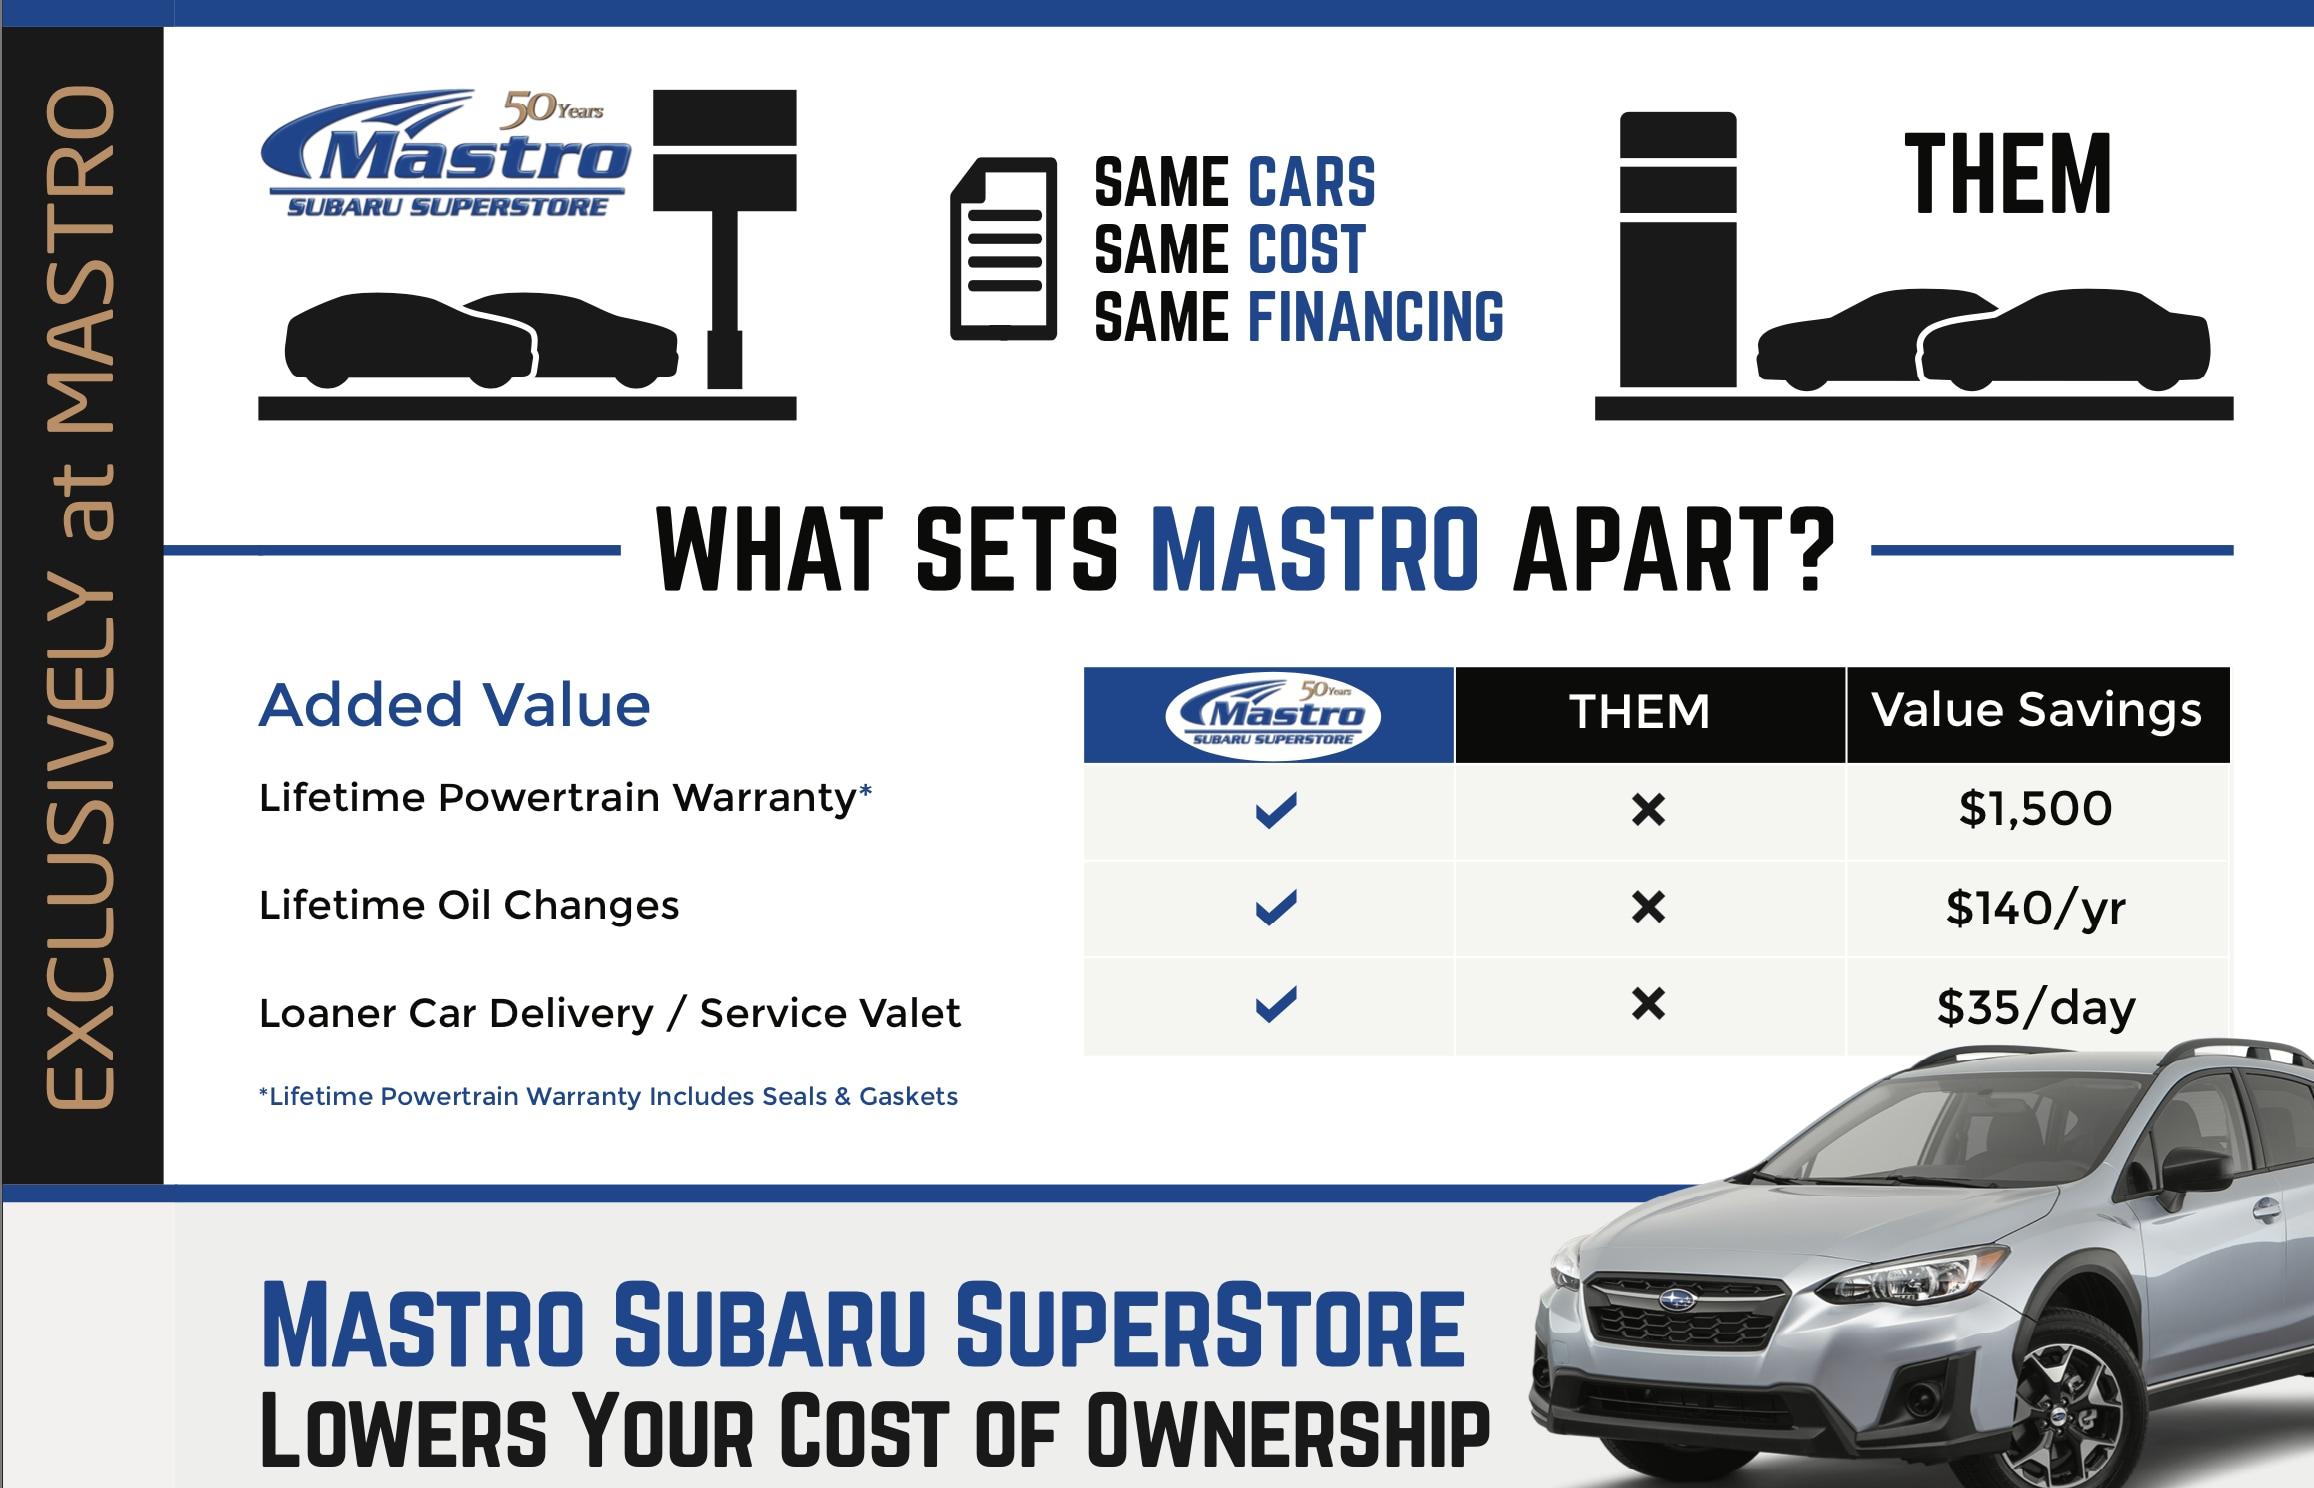 Subaru Lifetime Powertrain Warranty